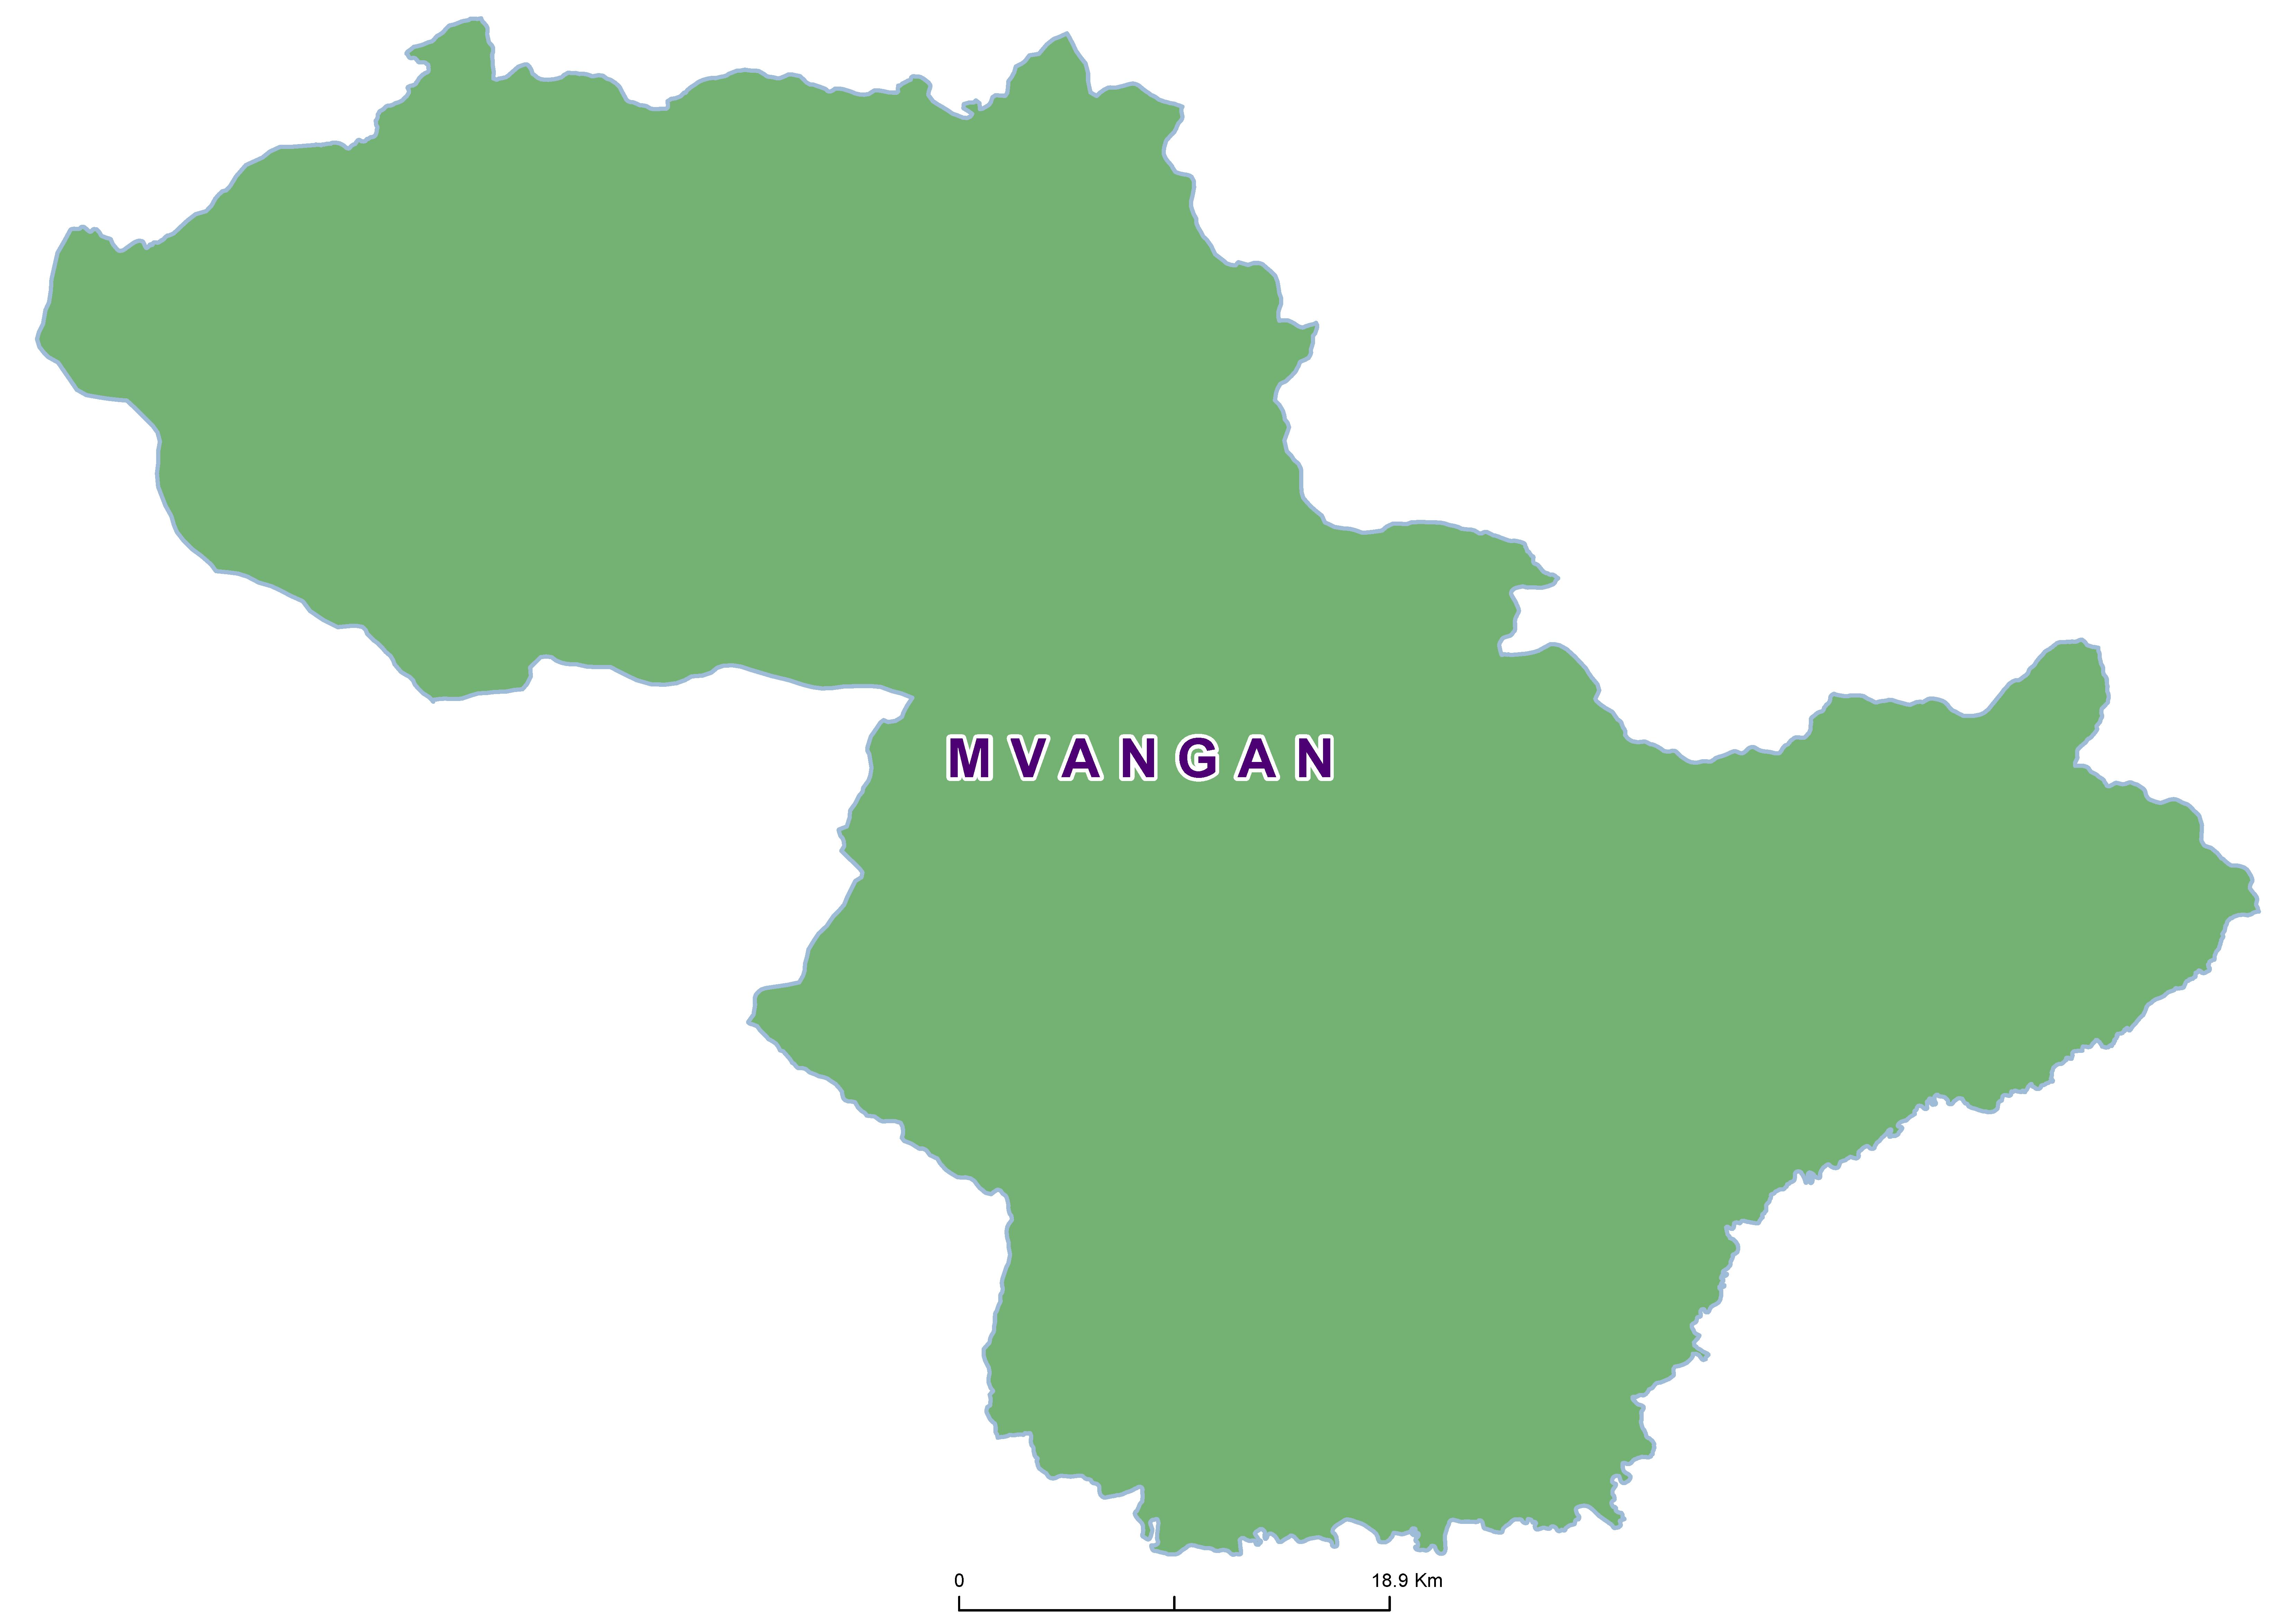 Mvangan Mean SCH 20100001